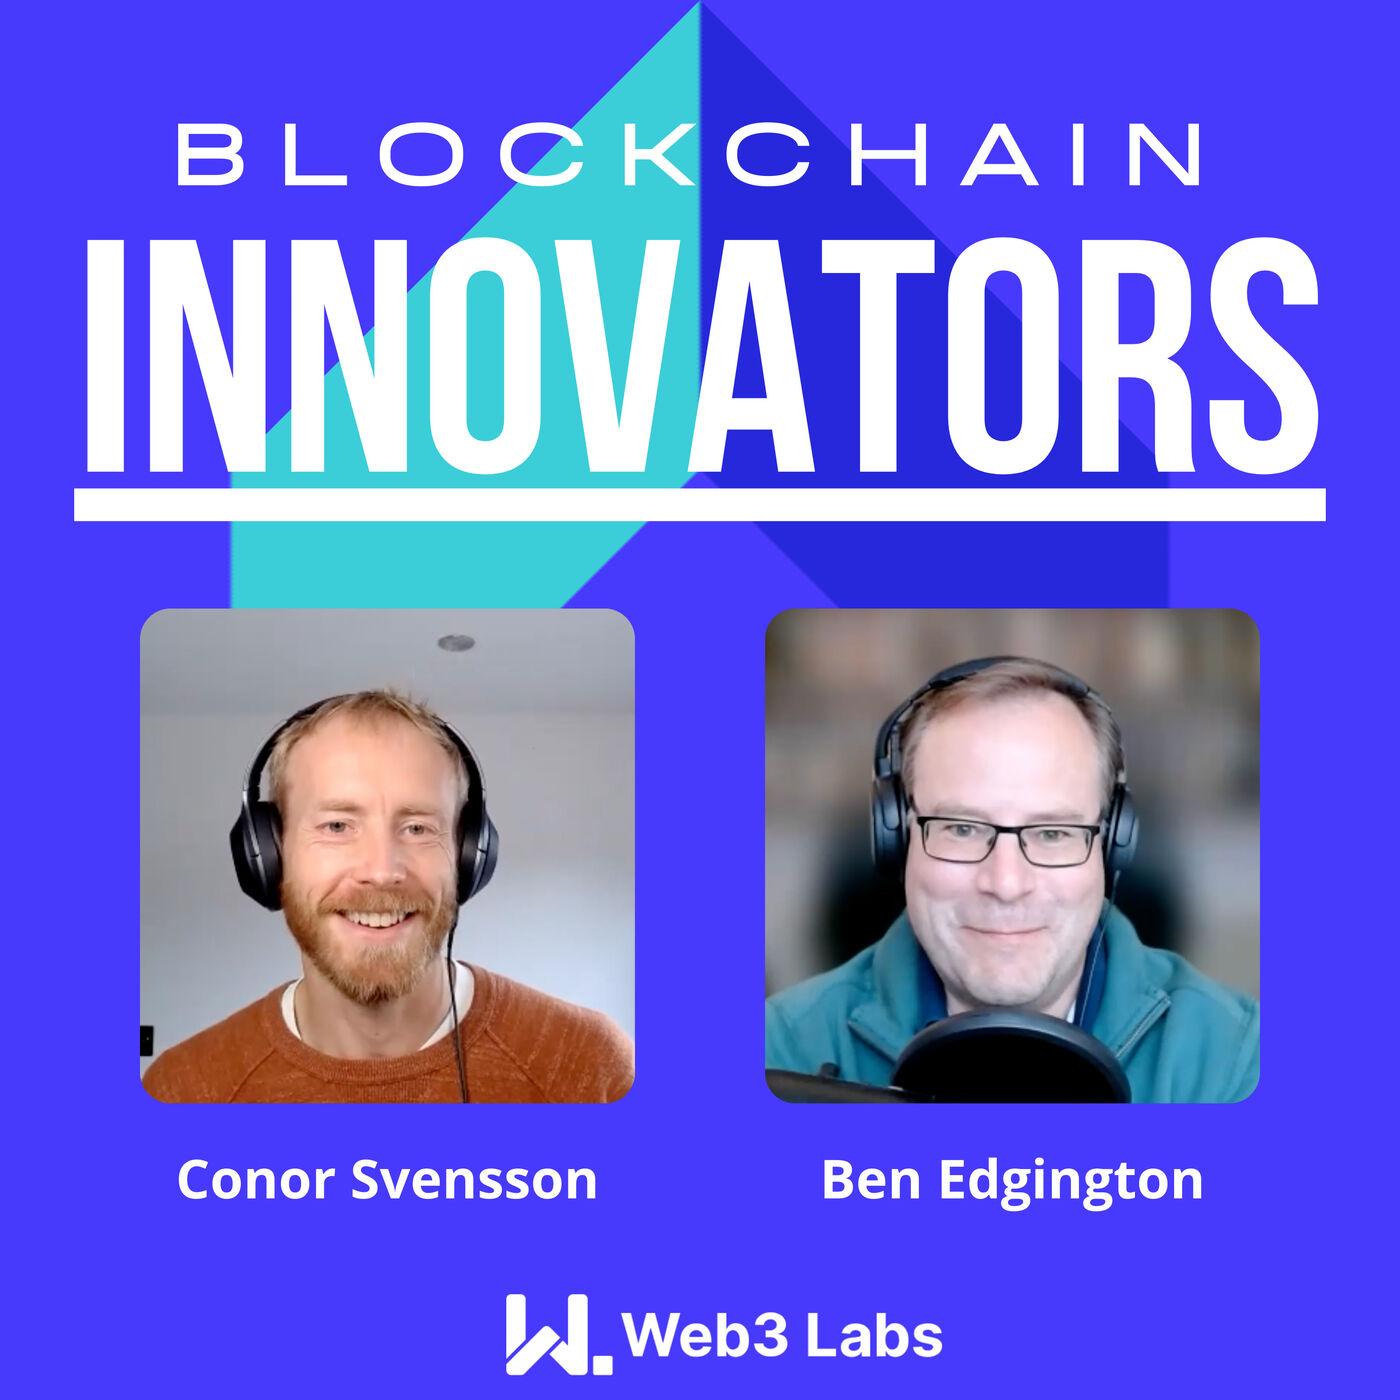 Blockchain Innovators - Conor Svensson and Ben Edgington